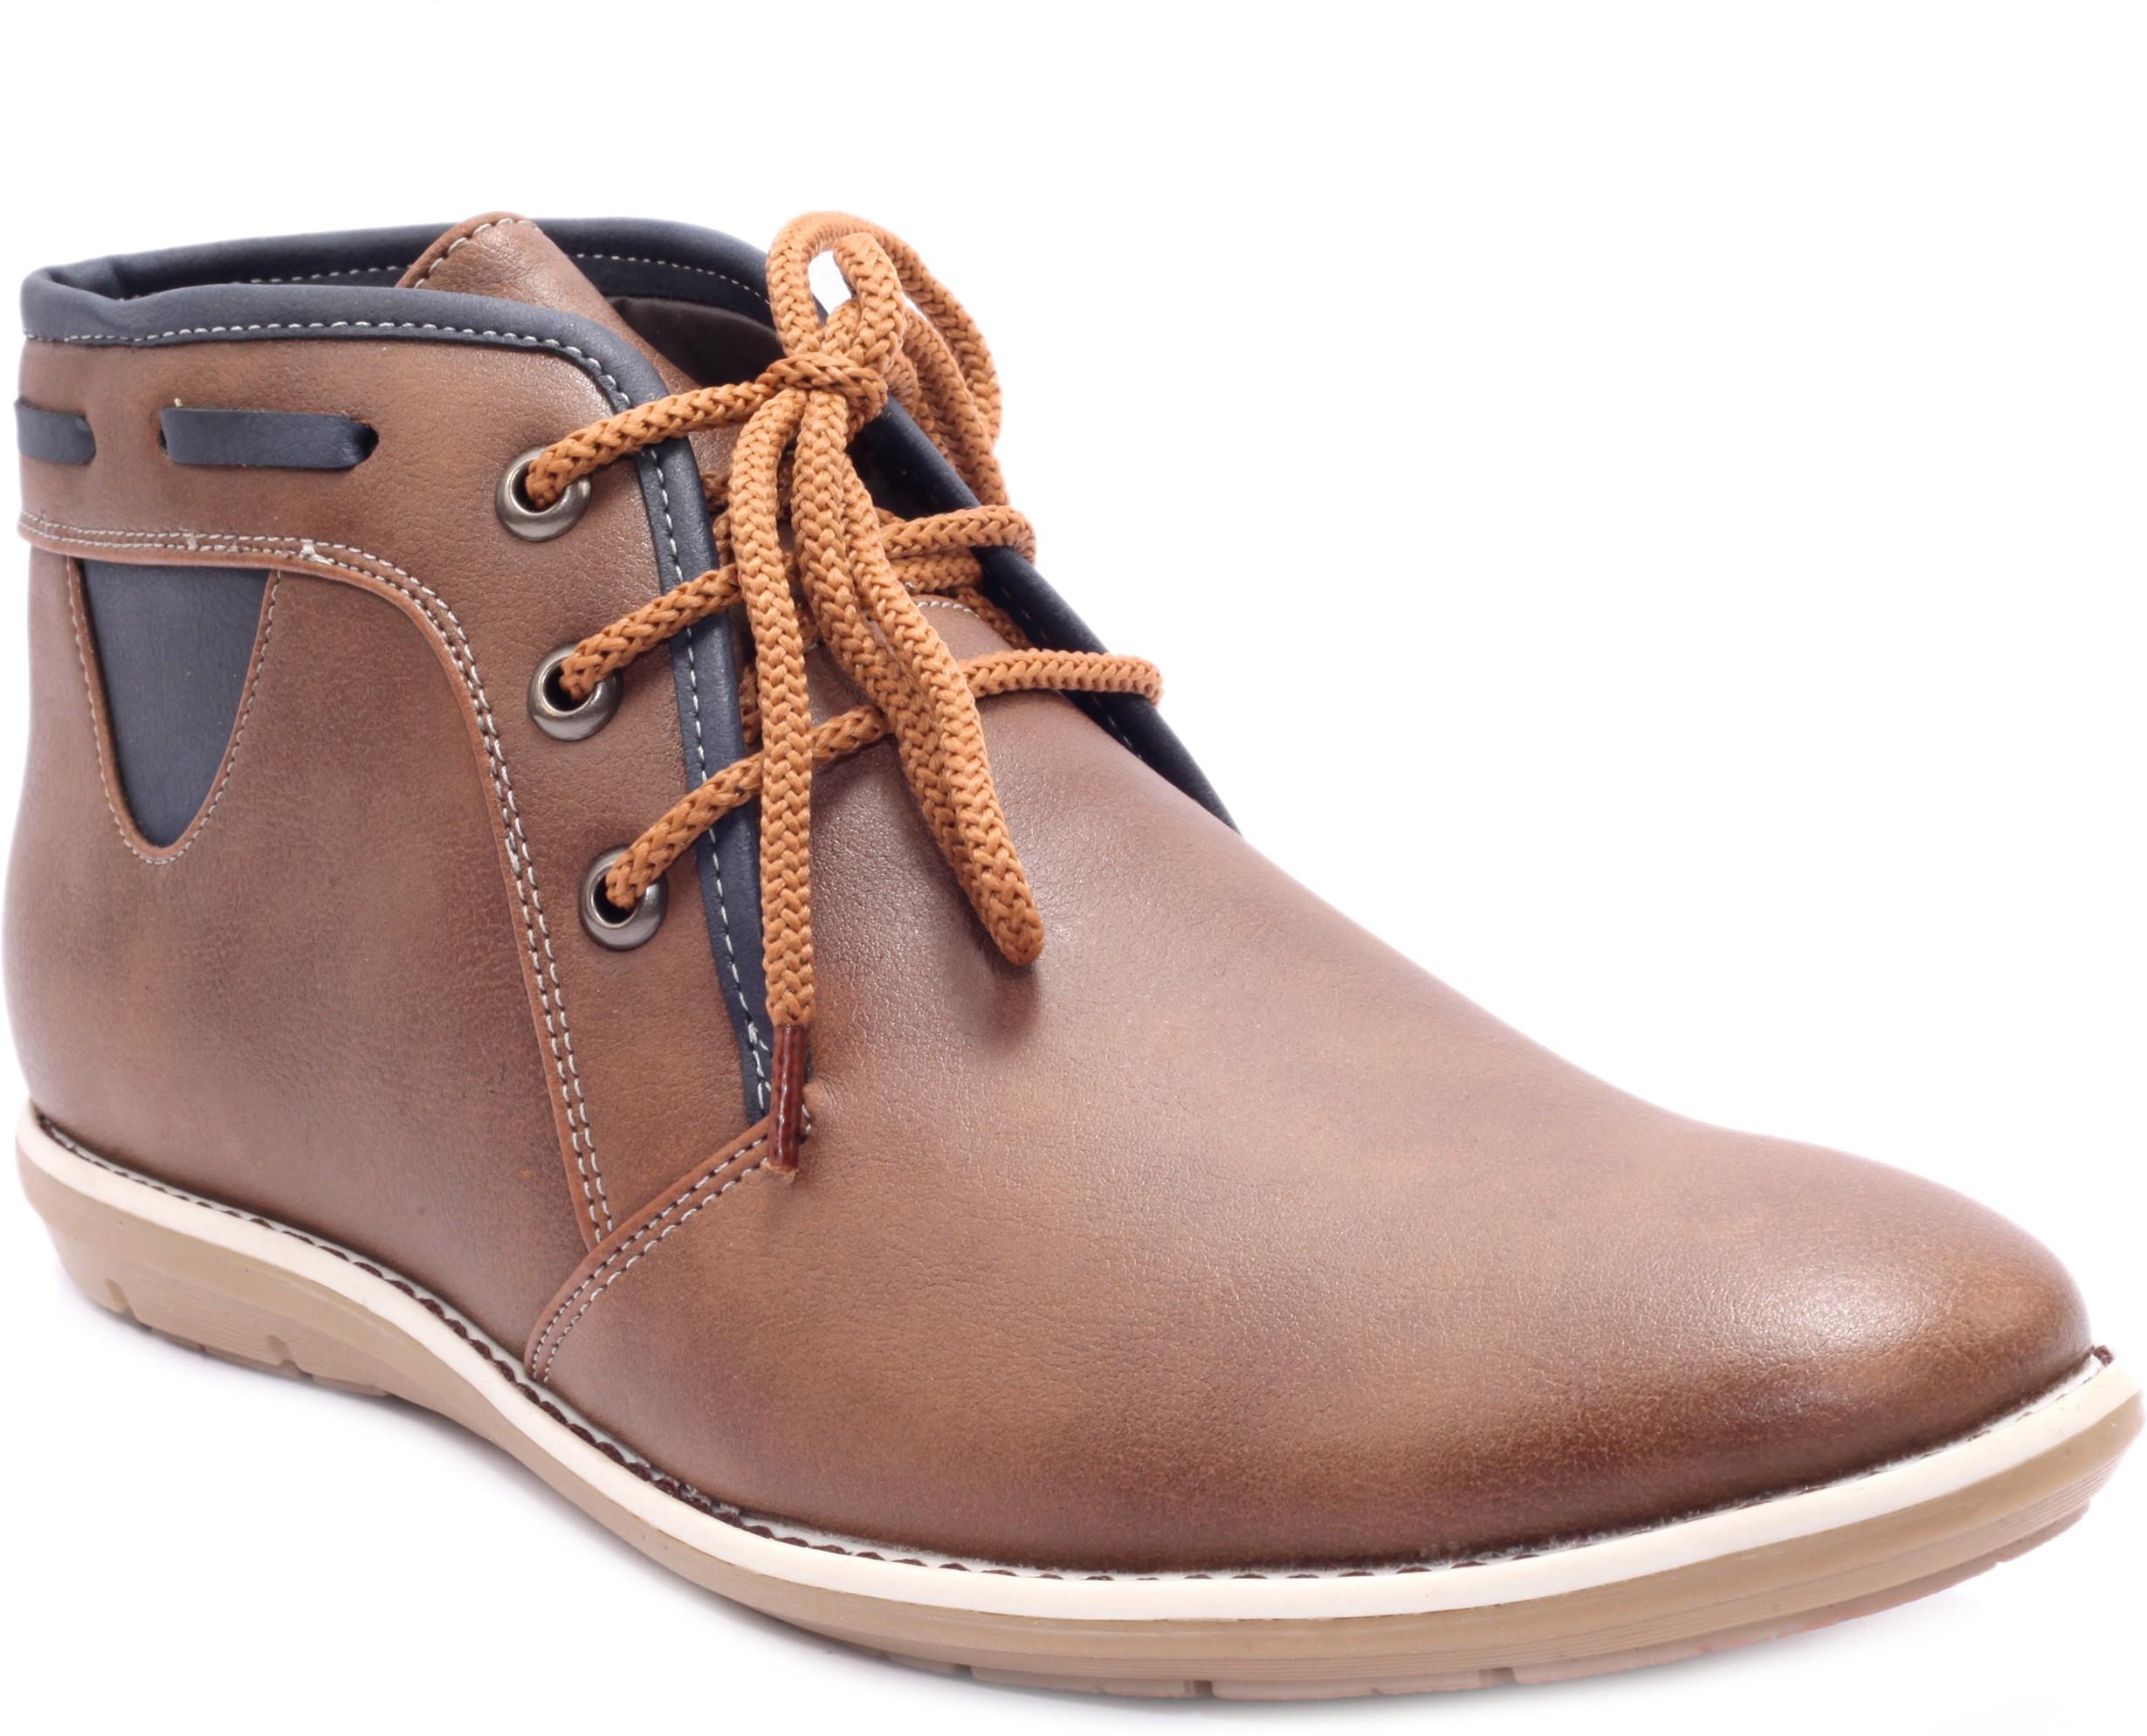 J Roland Vin Diesel Bin Camel Boots(Khaki)